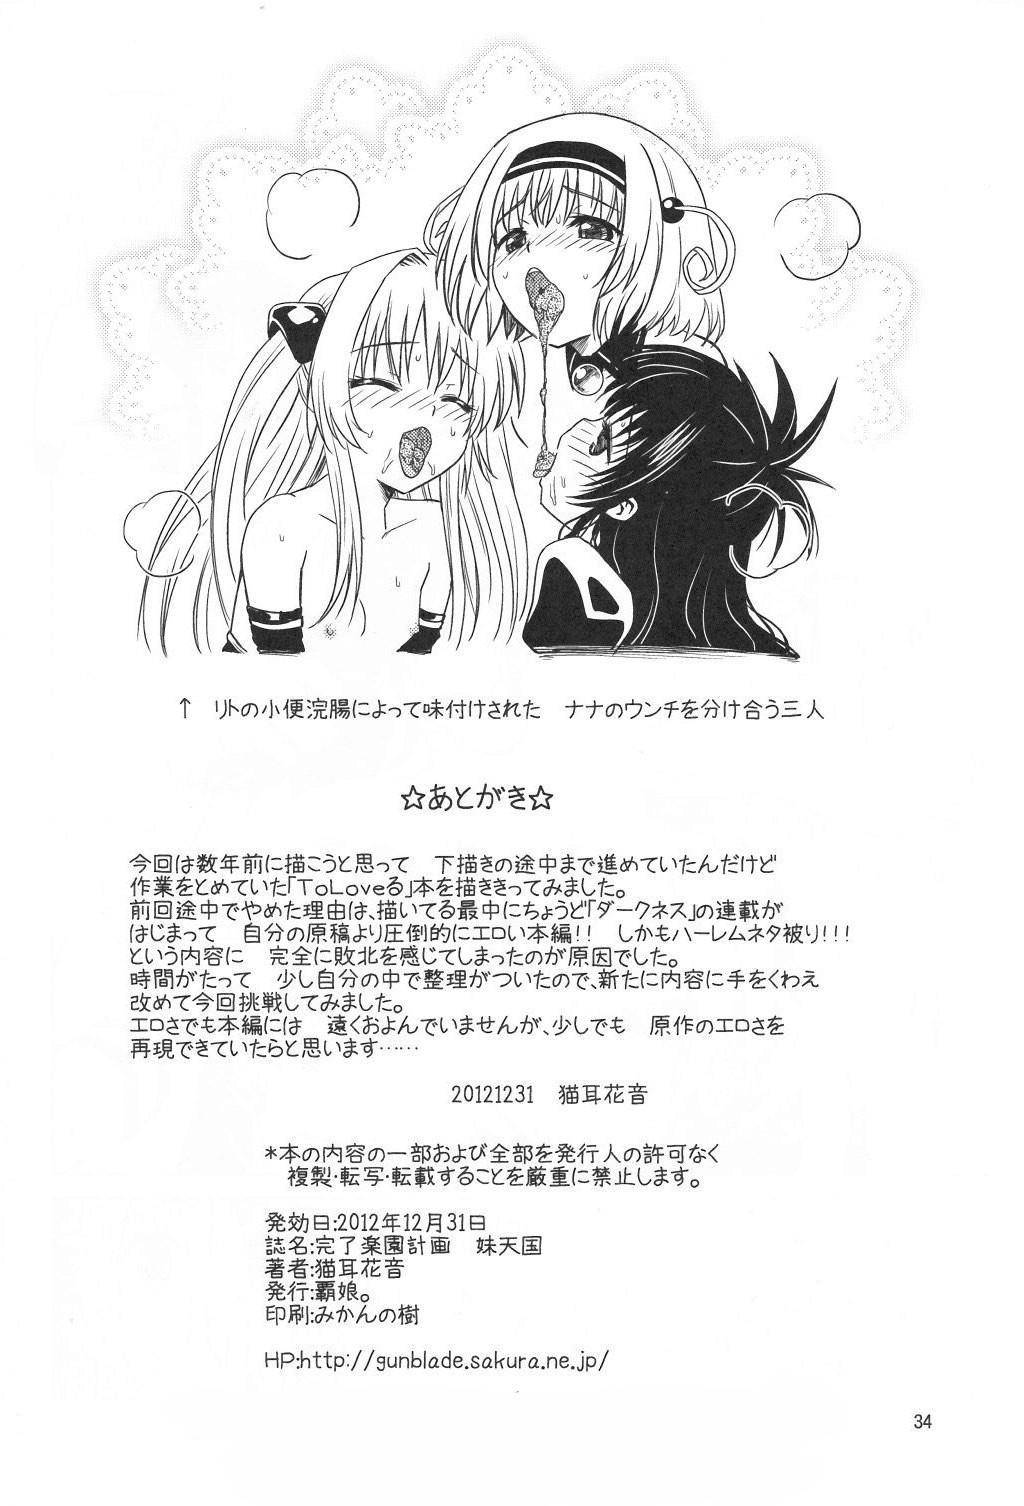 Kanryou Harem Keikaku Imouto Tengoku | Harem Plan Complete - Little Sister Heaven 33